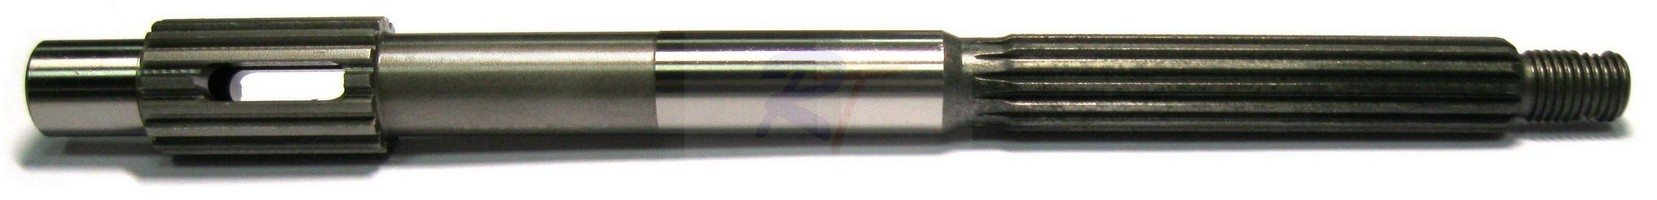 RTT-362-64211-0. Вал гребной RTT-362-64211-0